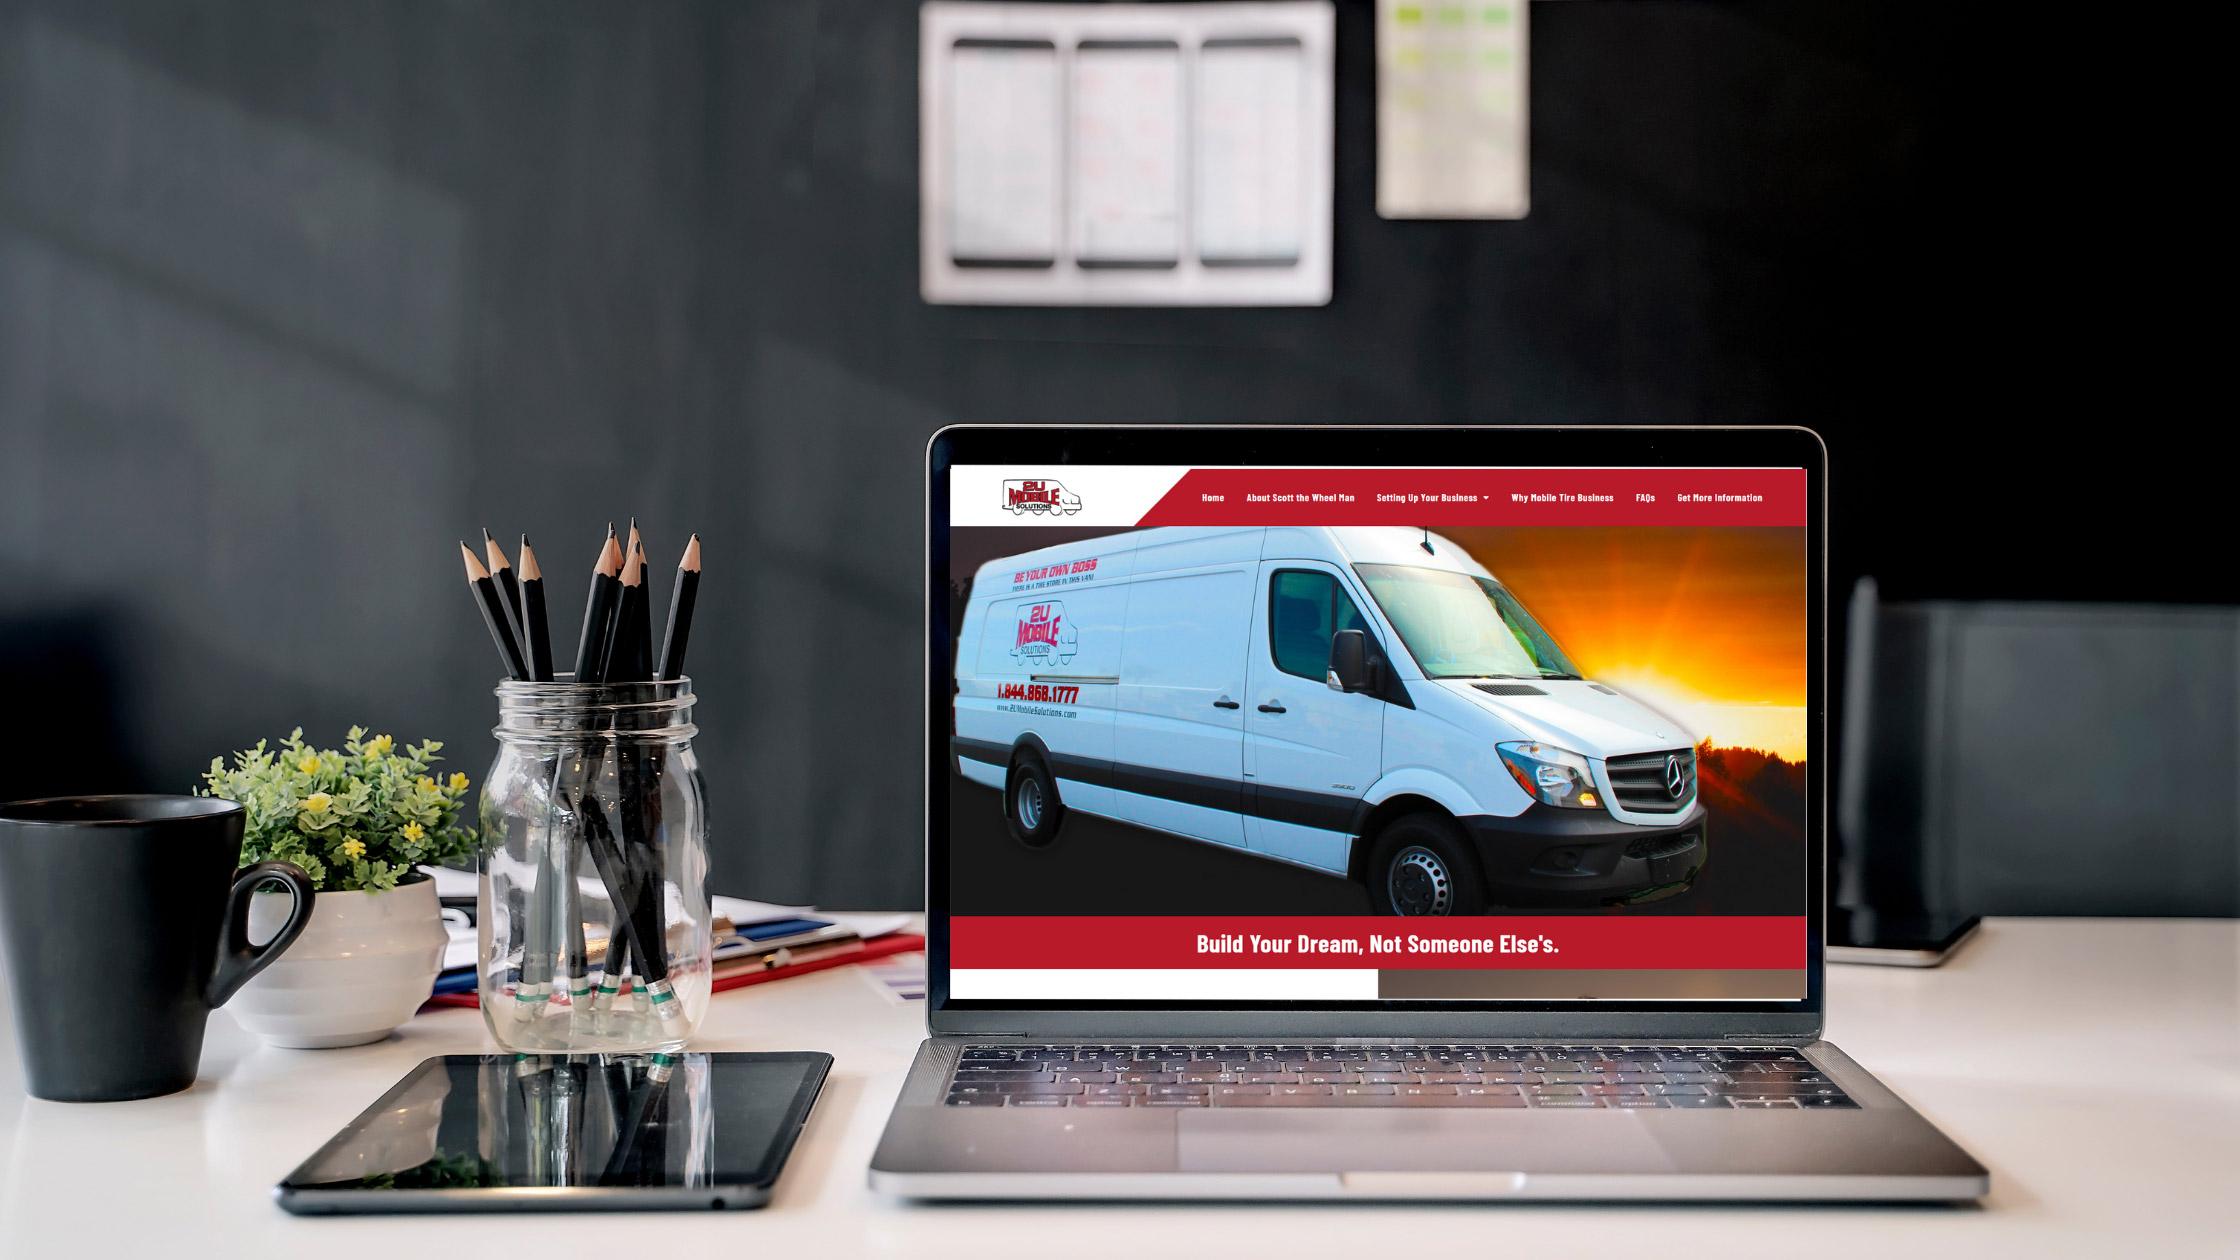 Website Design and Development: 2U Mobile Solutions